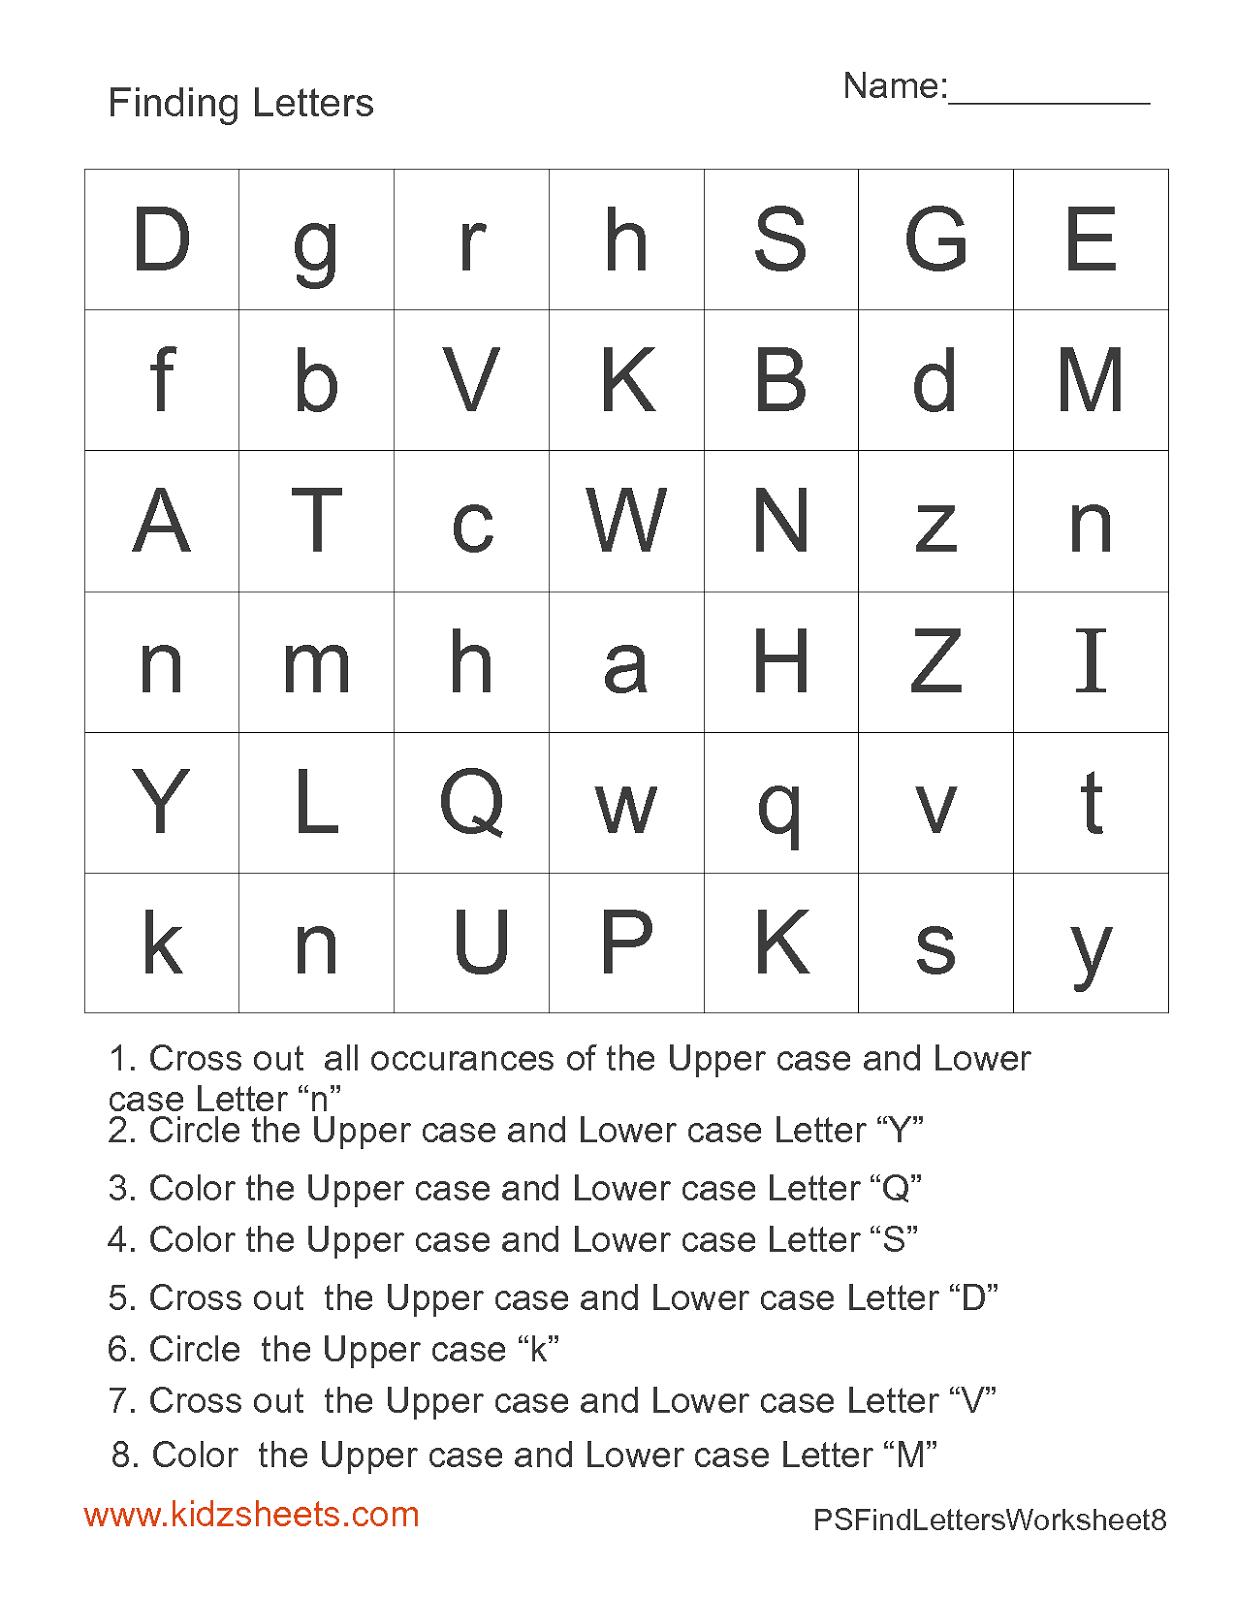 preschool worksheets Google Search For kids